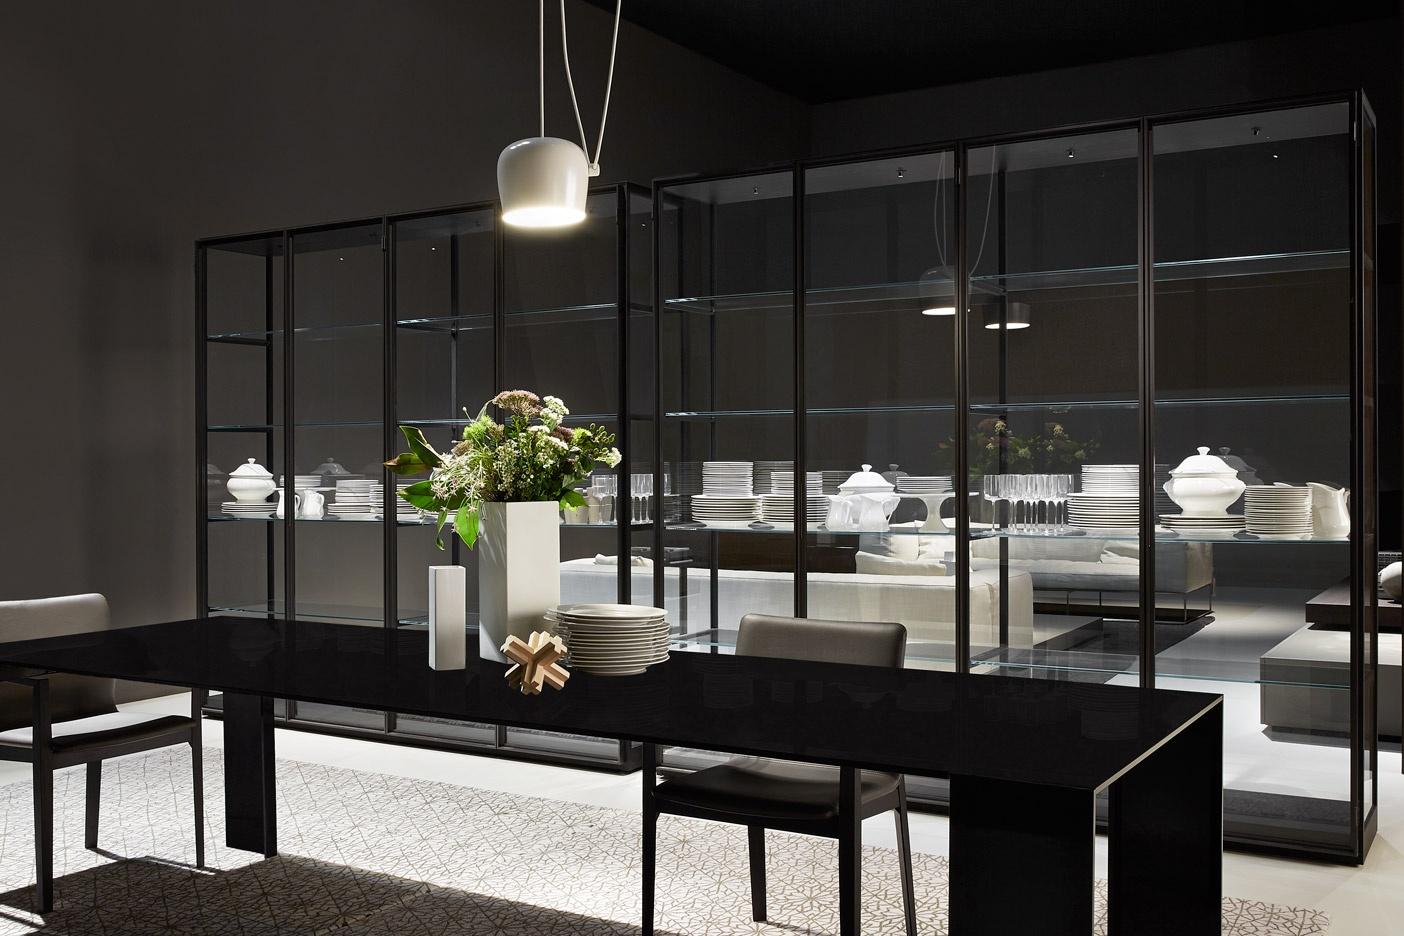 porro spa news eventi nuova apertura a londra. Black Bedroom Furniture Sets. Home Design Ideas